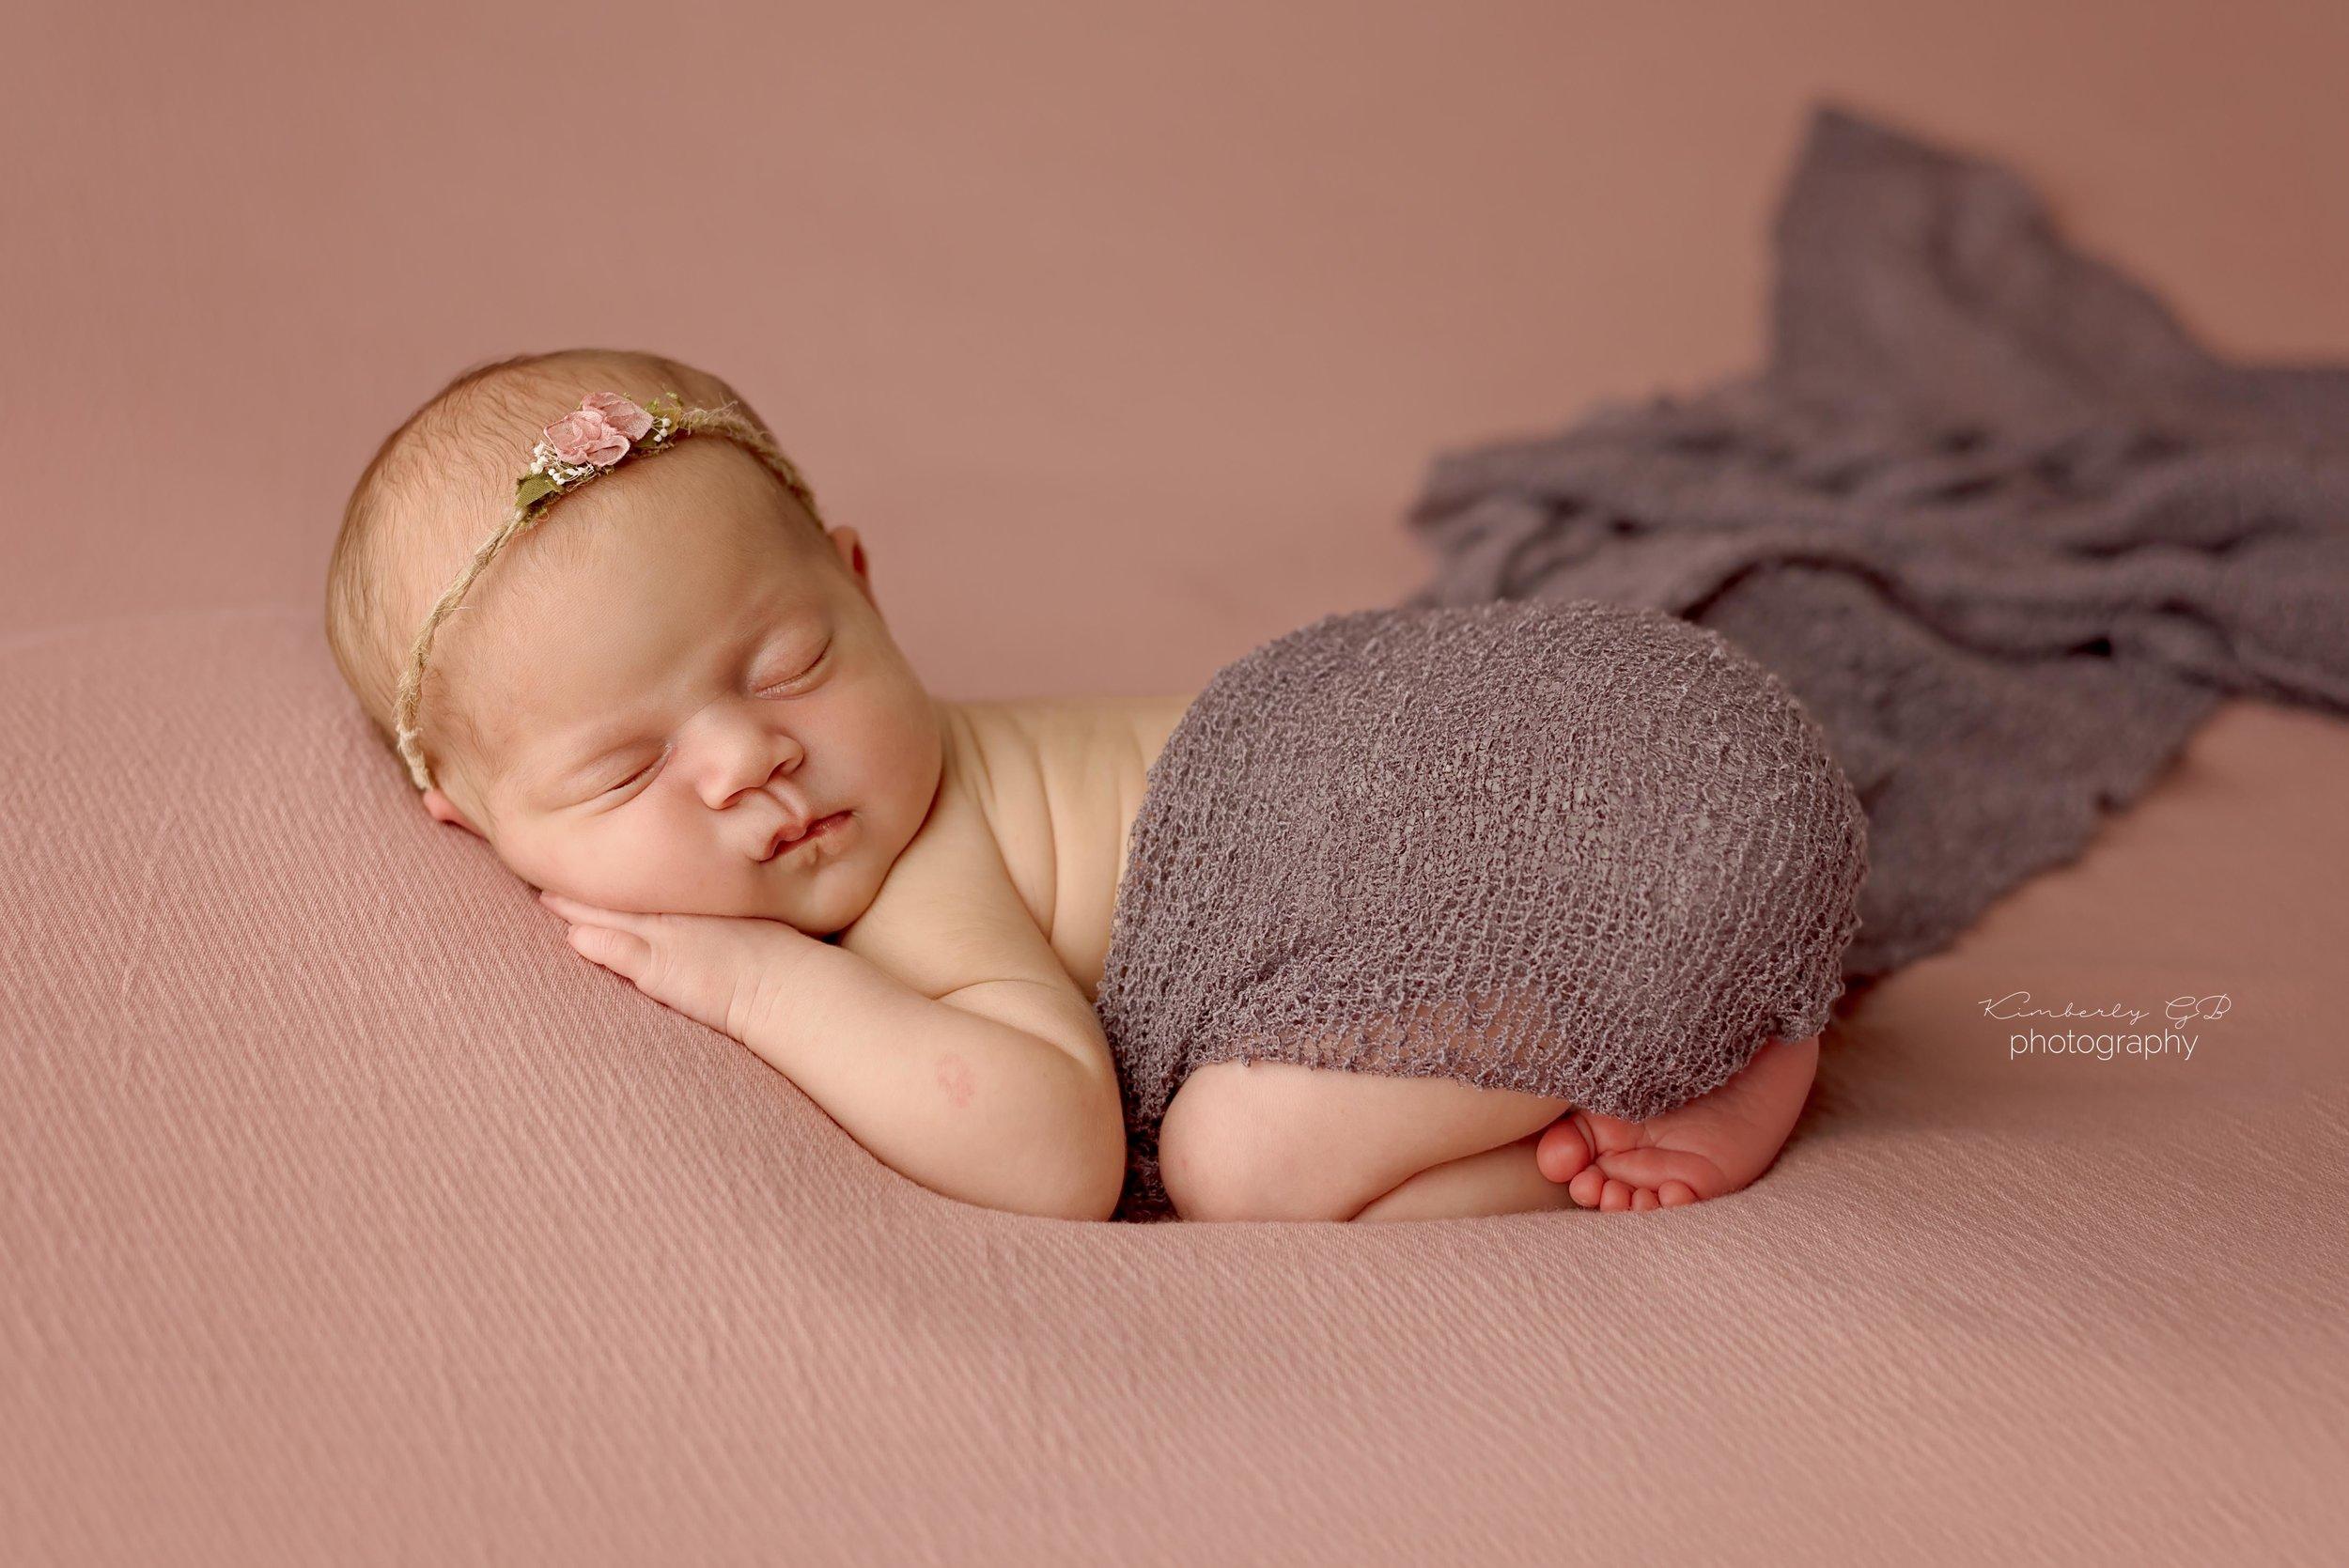 fotografia-de-recien-nacidos-bebes-newborn-en-puerto-rico-kimberly-gb-photography-fotografa-167.jpg